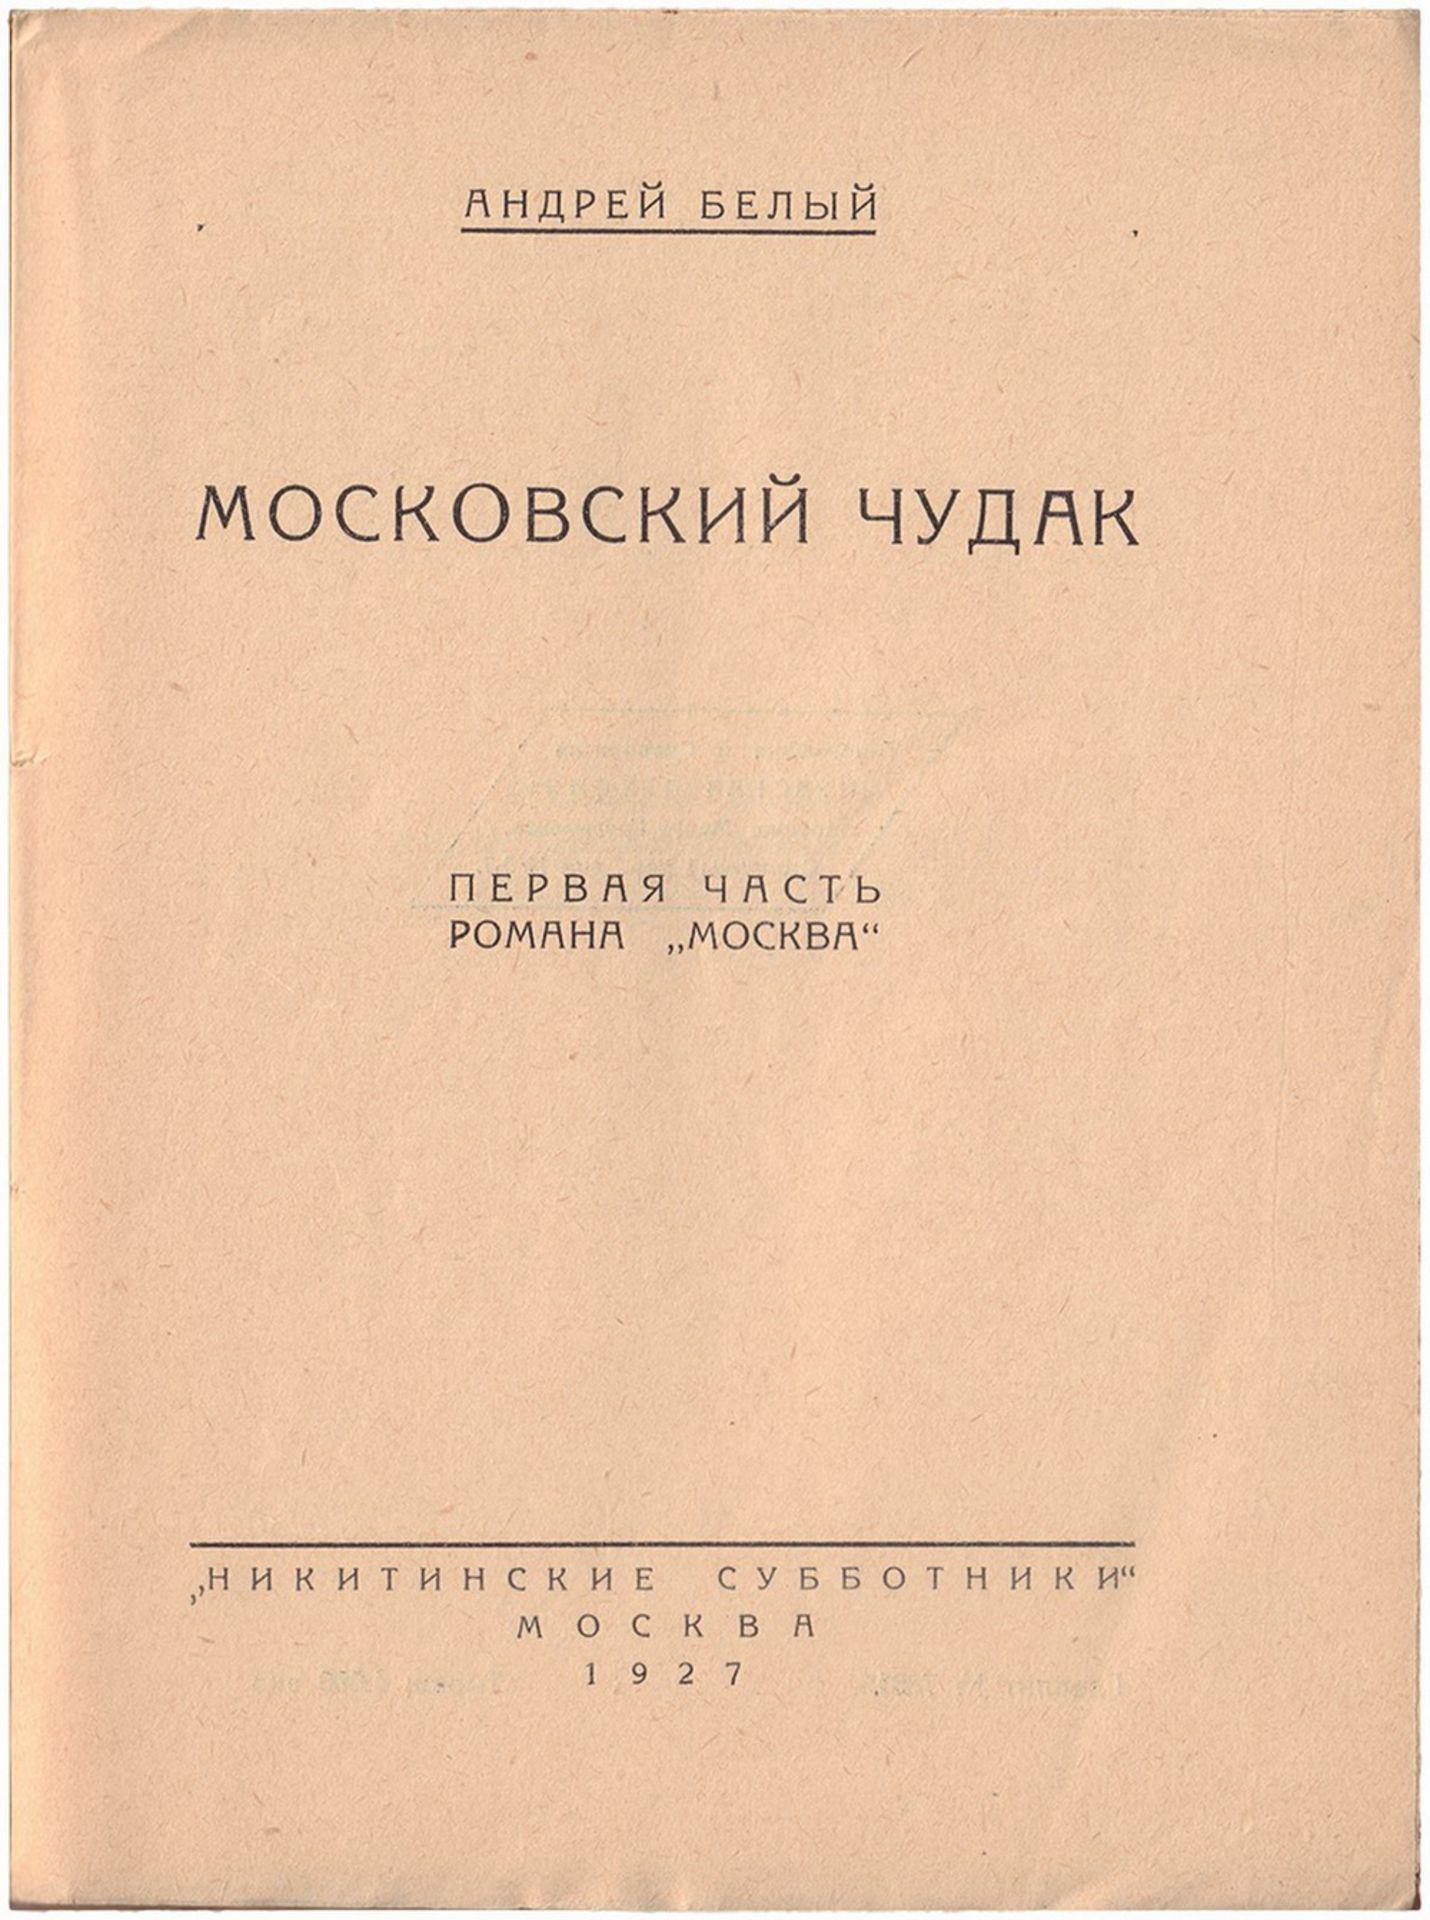 [Telingater, S., design. Soviet art]. Bely, A. Moscow eccentric. - 2d edition. Moscow, 1927. - 250,  - Bild 2 aus 2